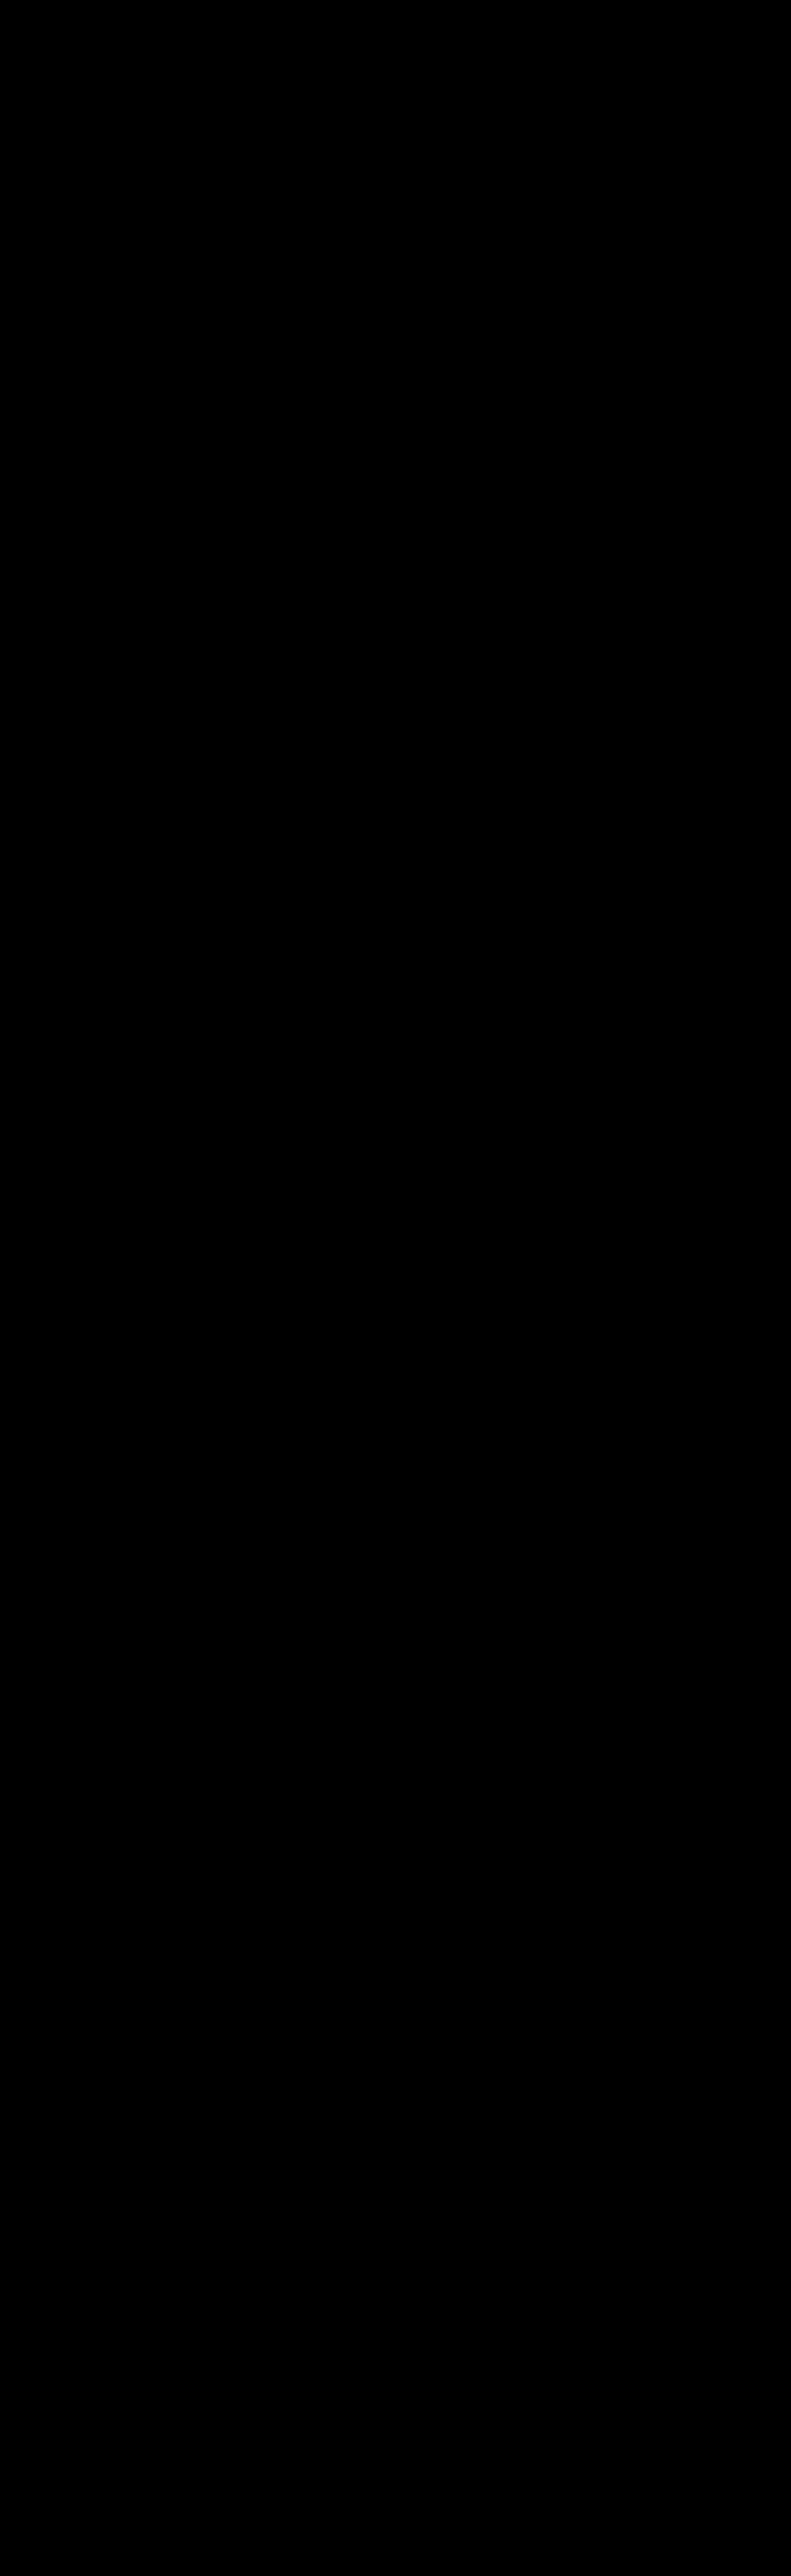 Vegeta Super Sainy 3 Free Coloring